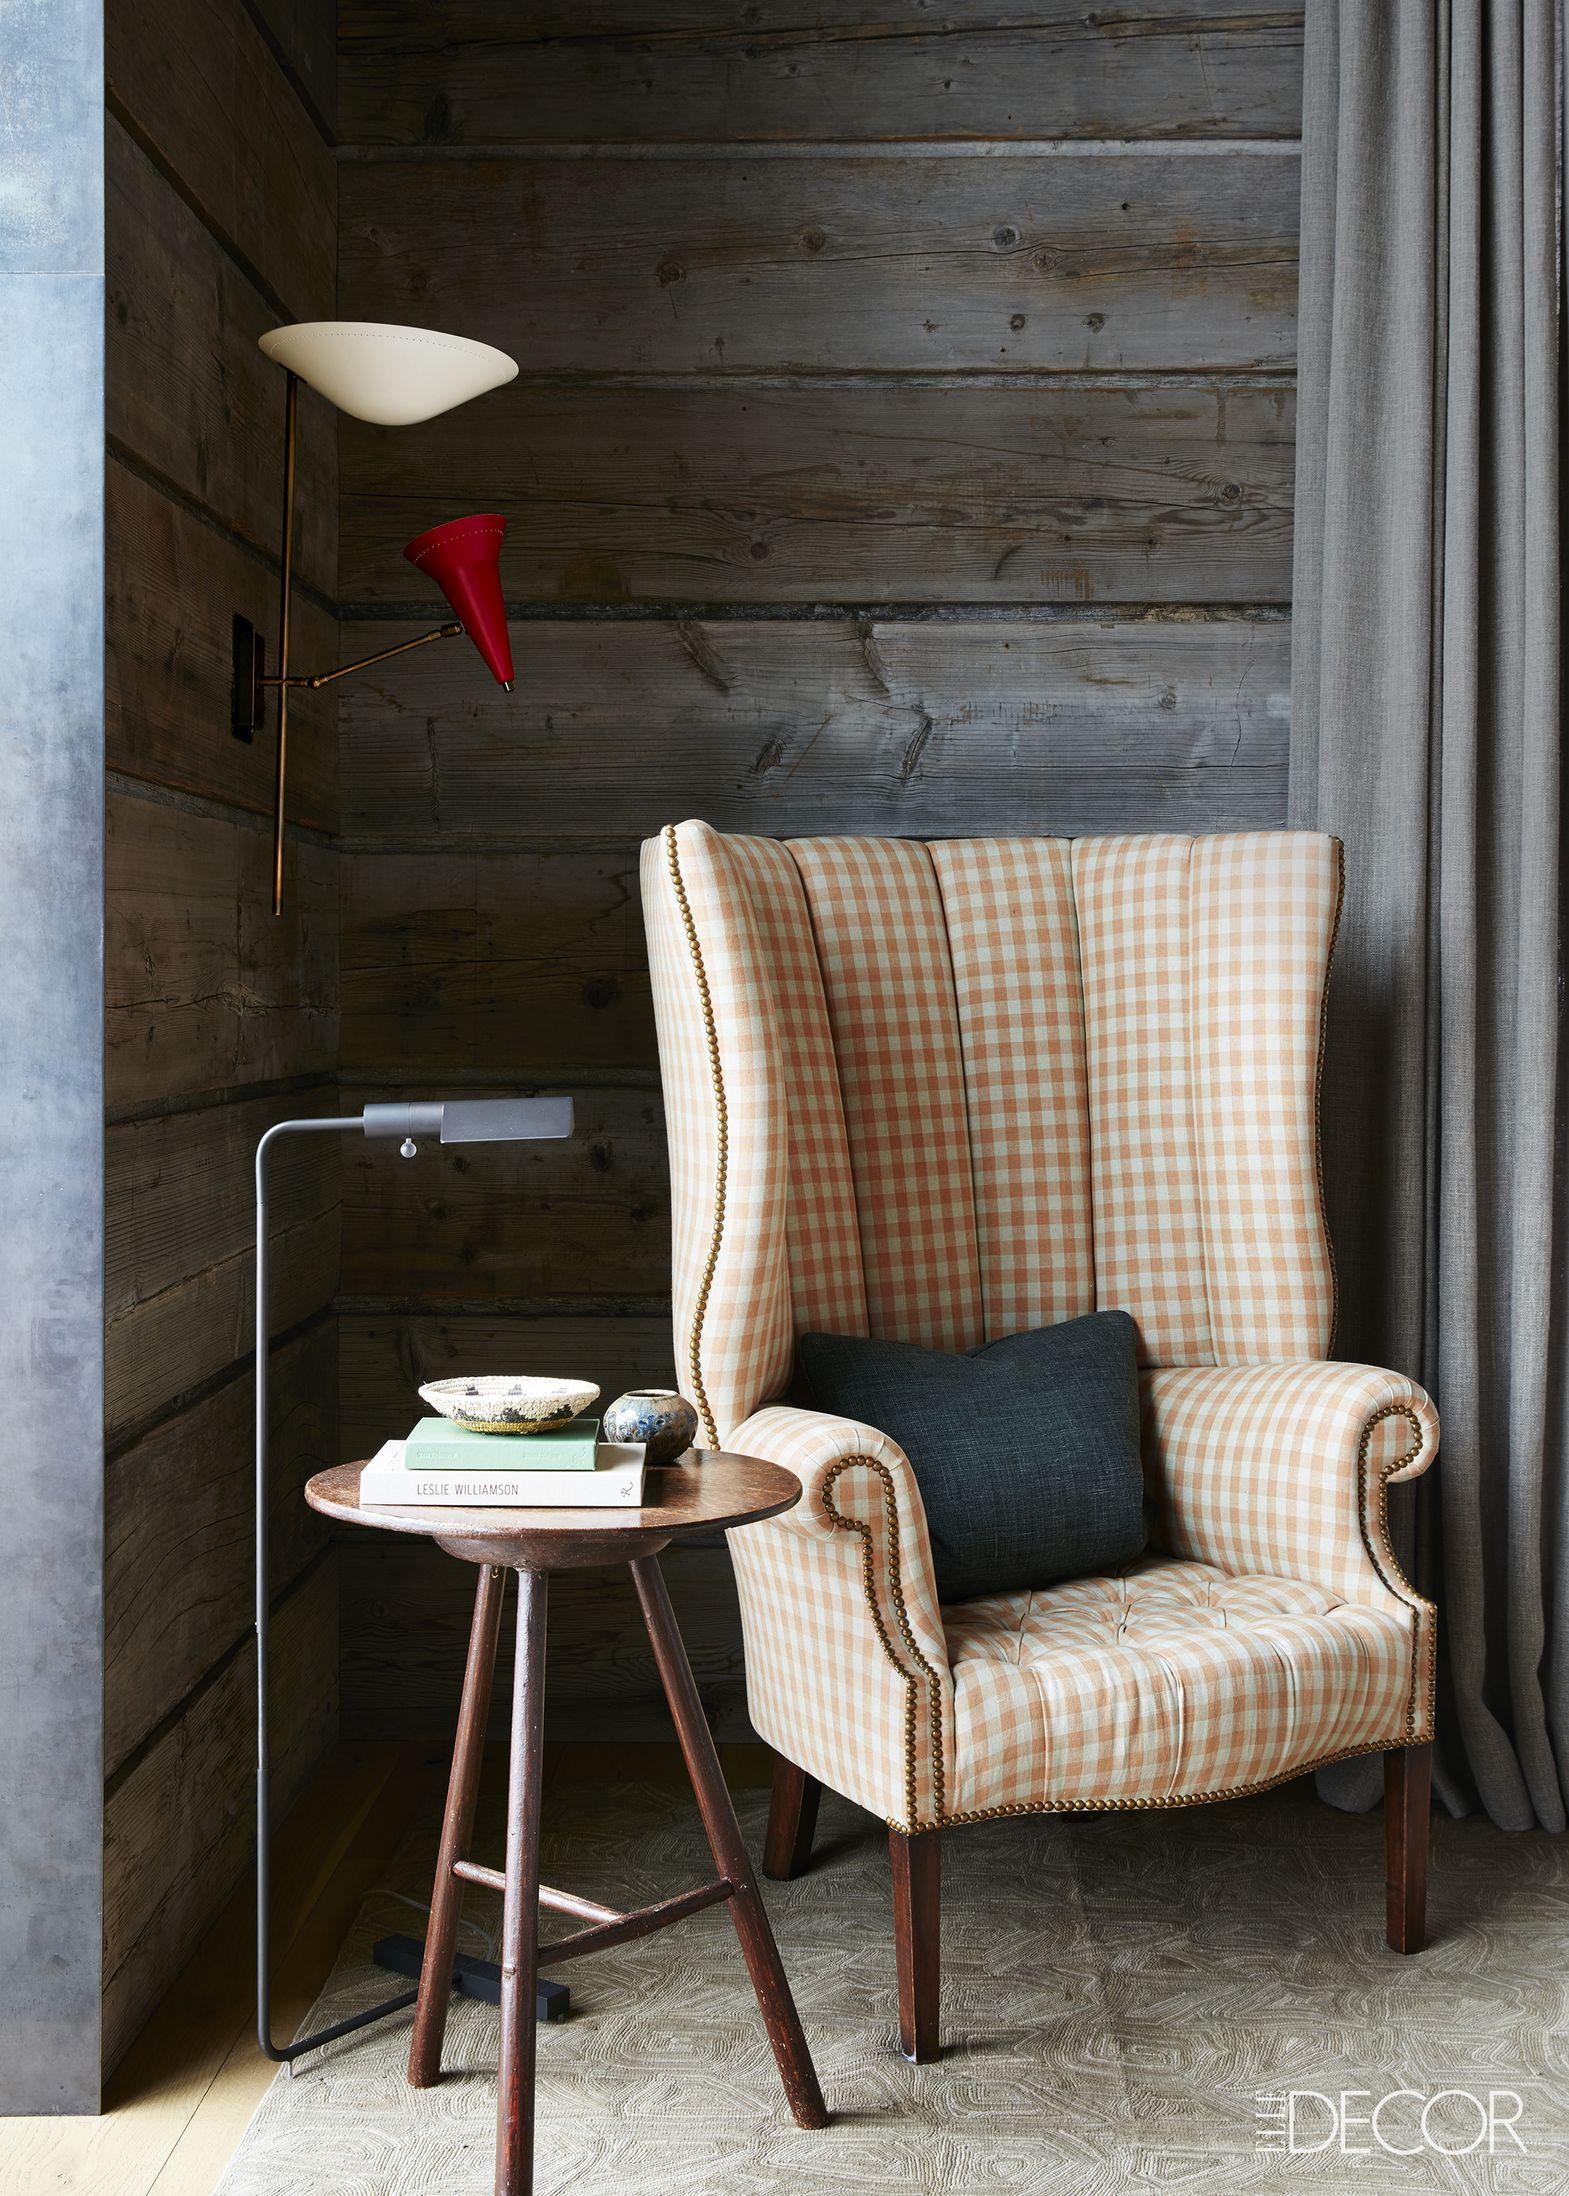 Get The Look Modern Rustic Interior Design In A Masculine